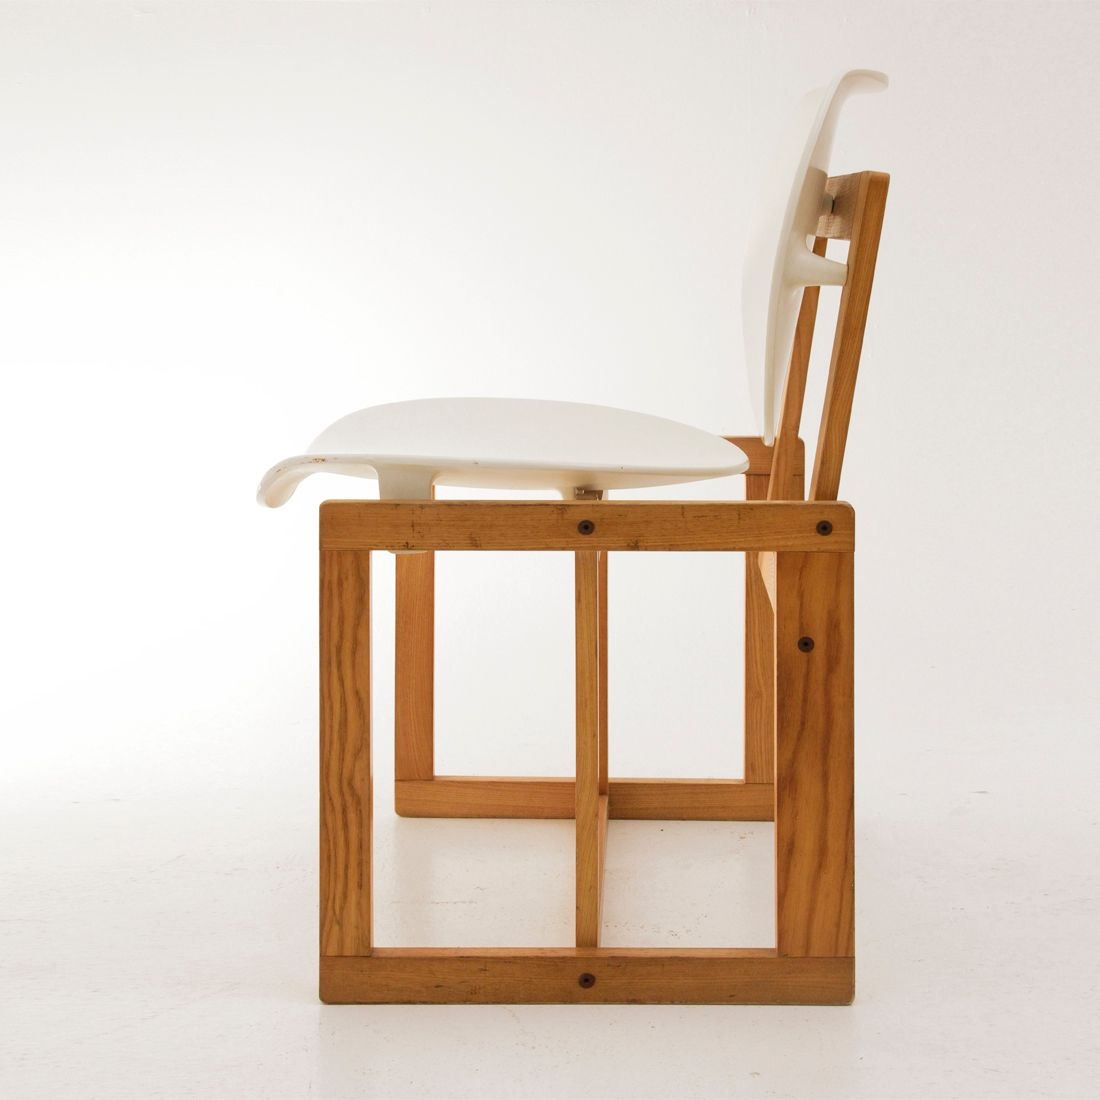 italienischer vintage stuhl aus holz wei em kunststoff 1970er bei pamono kaufen. Black Bedroom Furniture Sets. Home Design Ideas